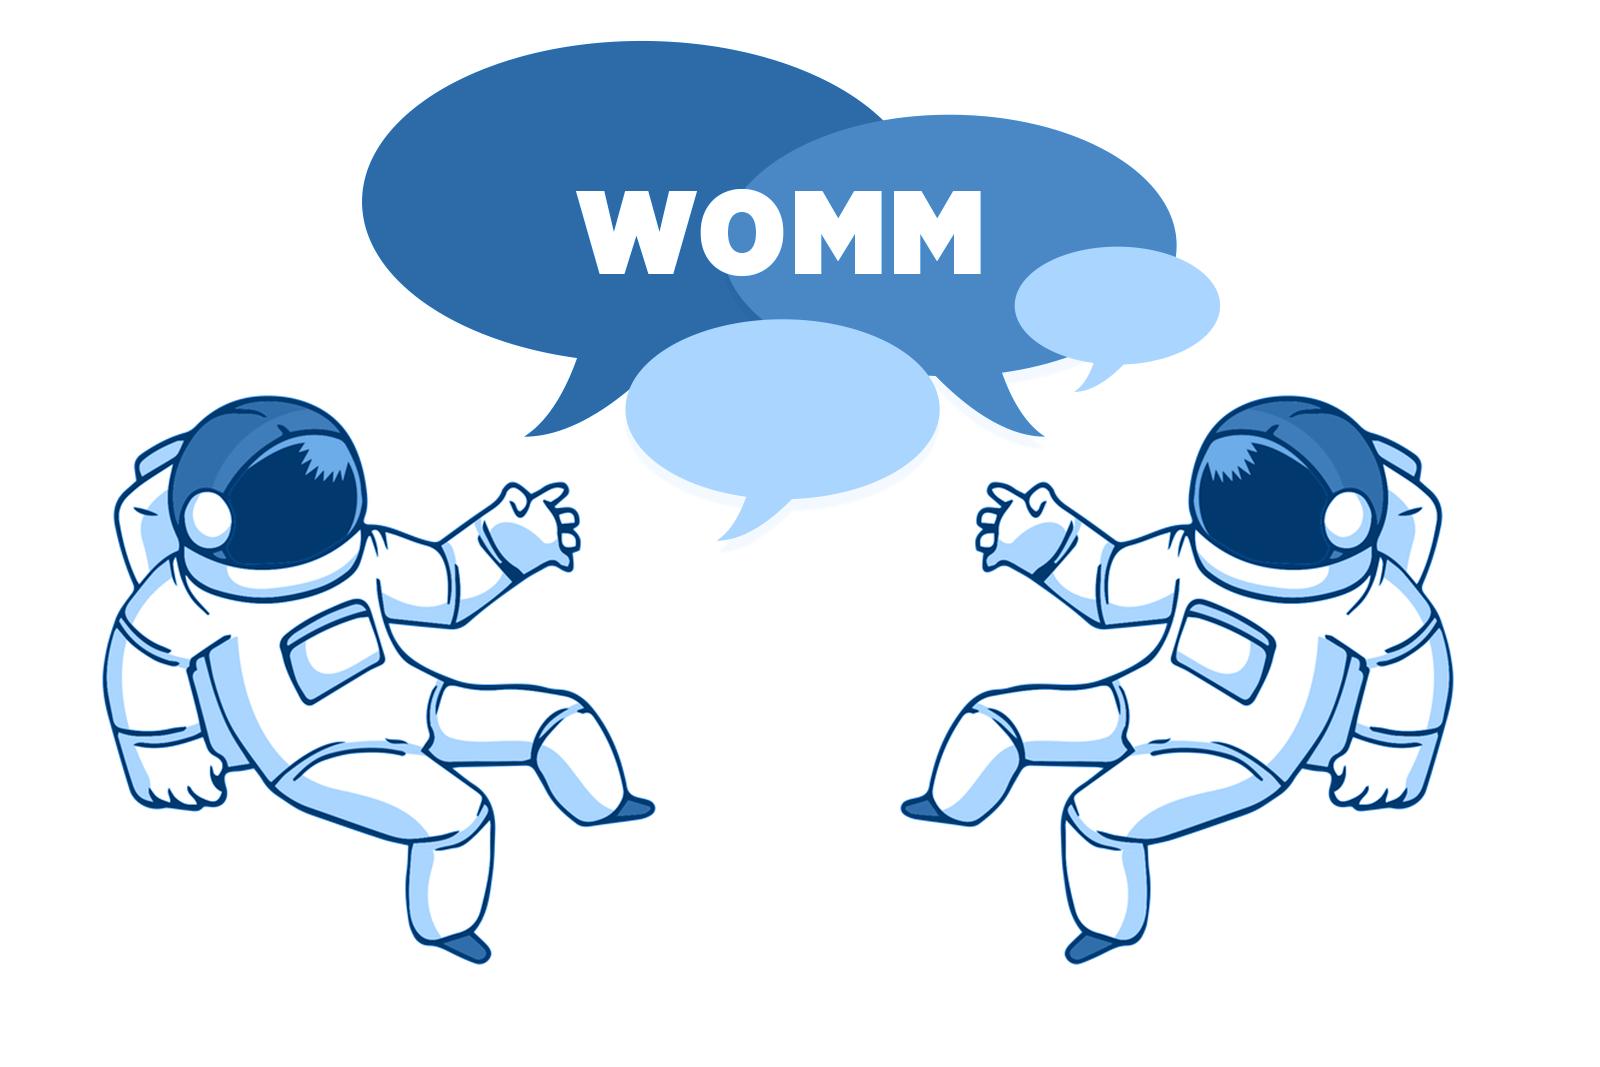 WOMM 1600x1067 - Sosyal Medya Yönetimi